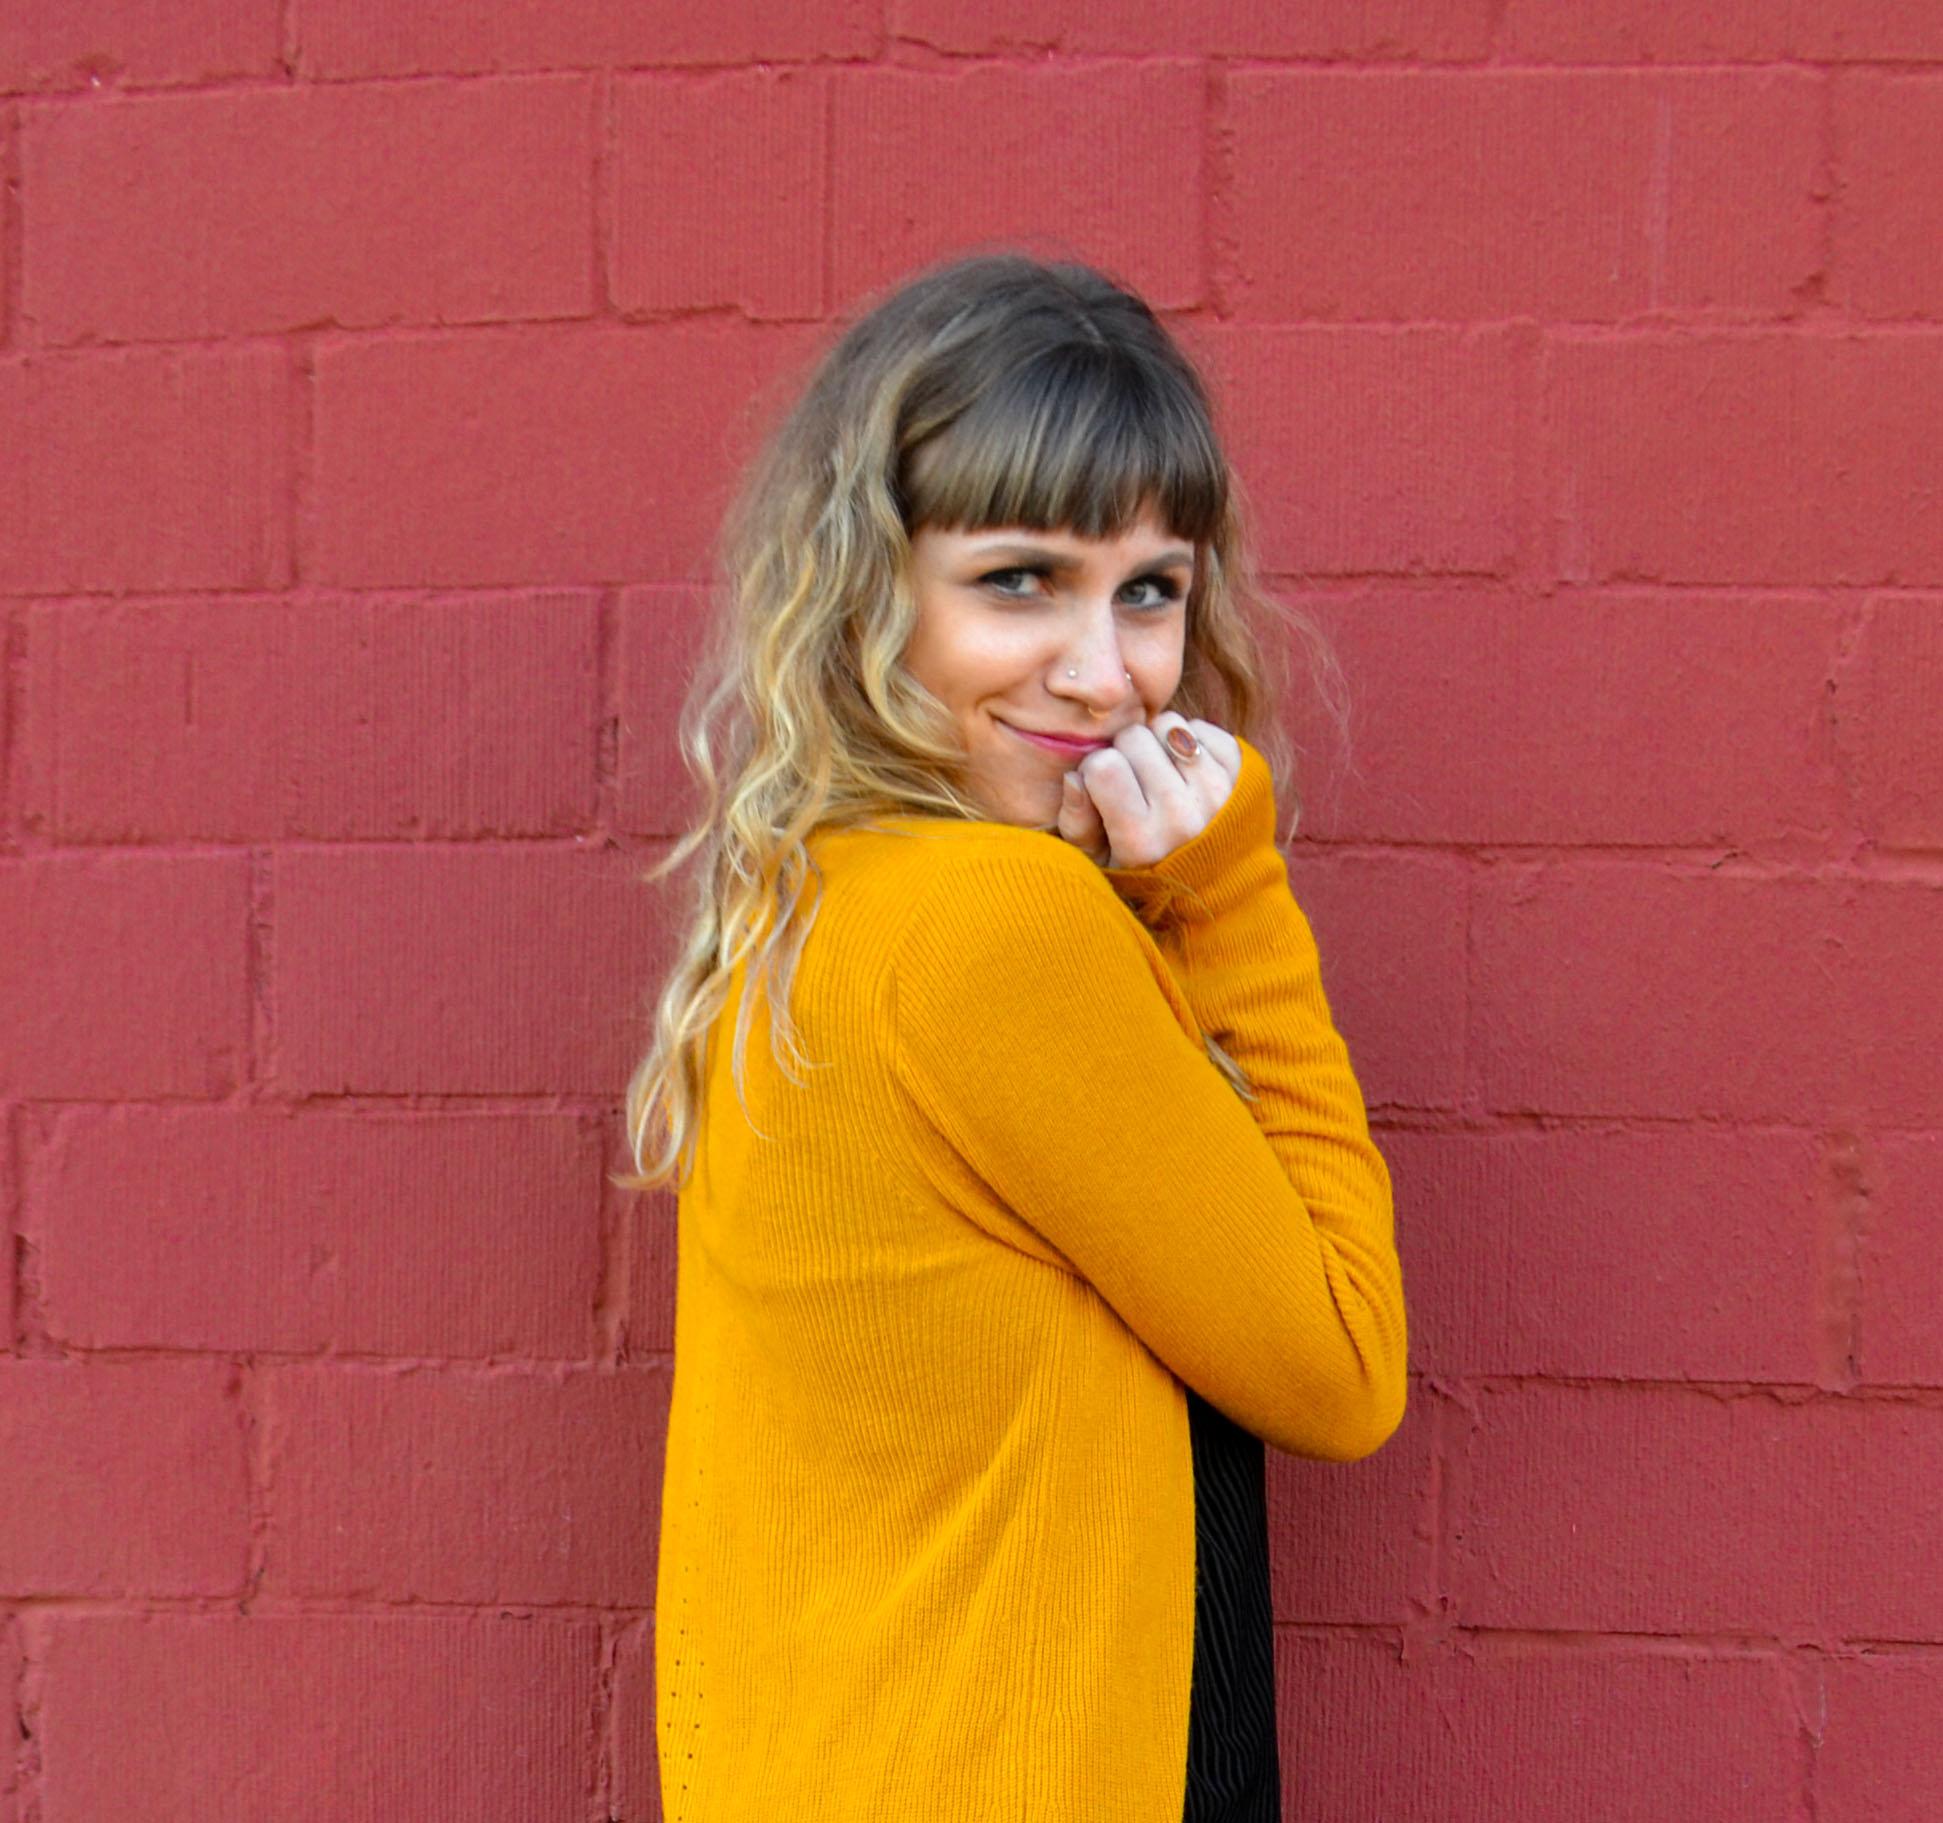 The Unplugged Creative Podcast with Arielle Zadok Episode 8 Painter Illustrator and Silkscreen Artist Erika Wynn